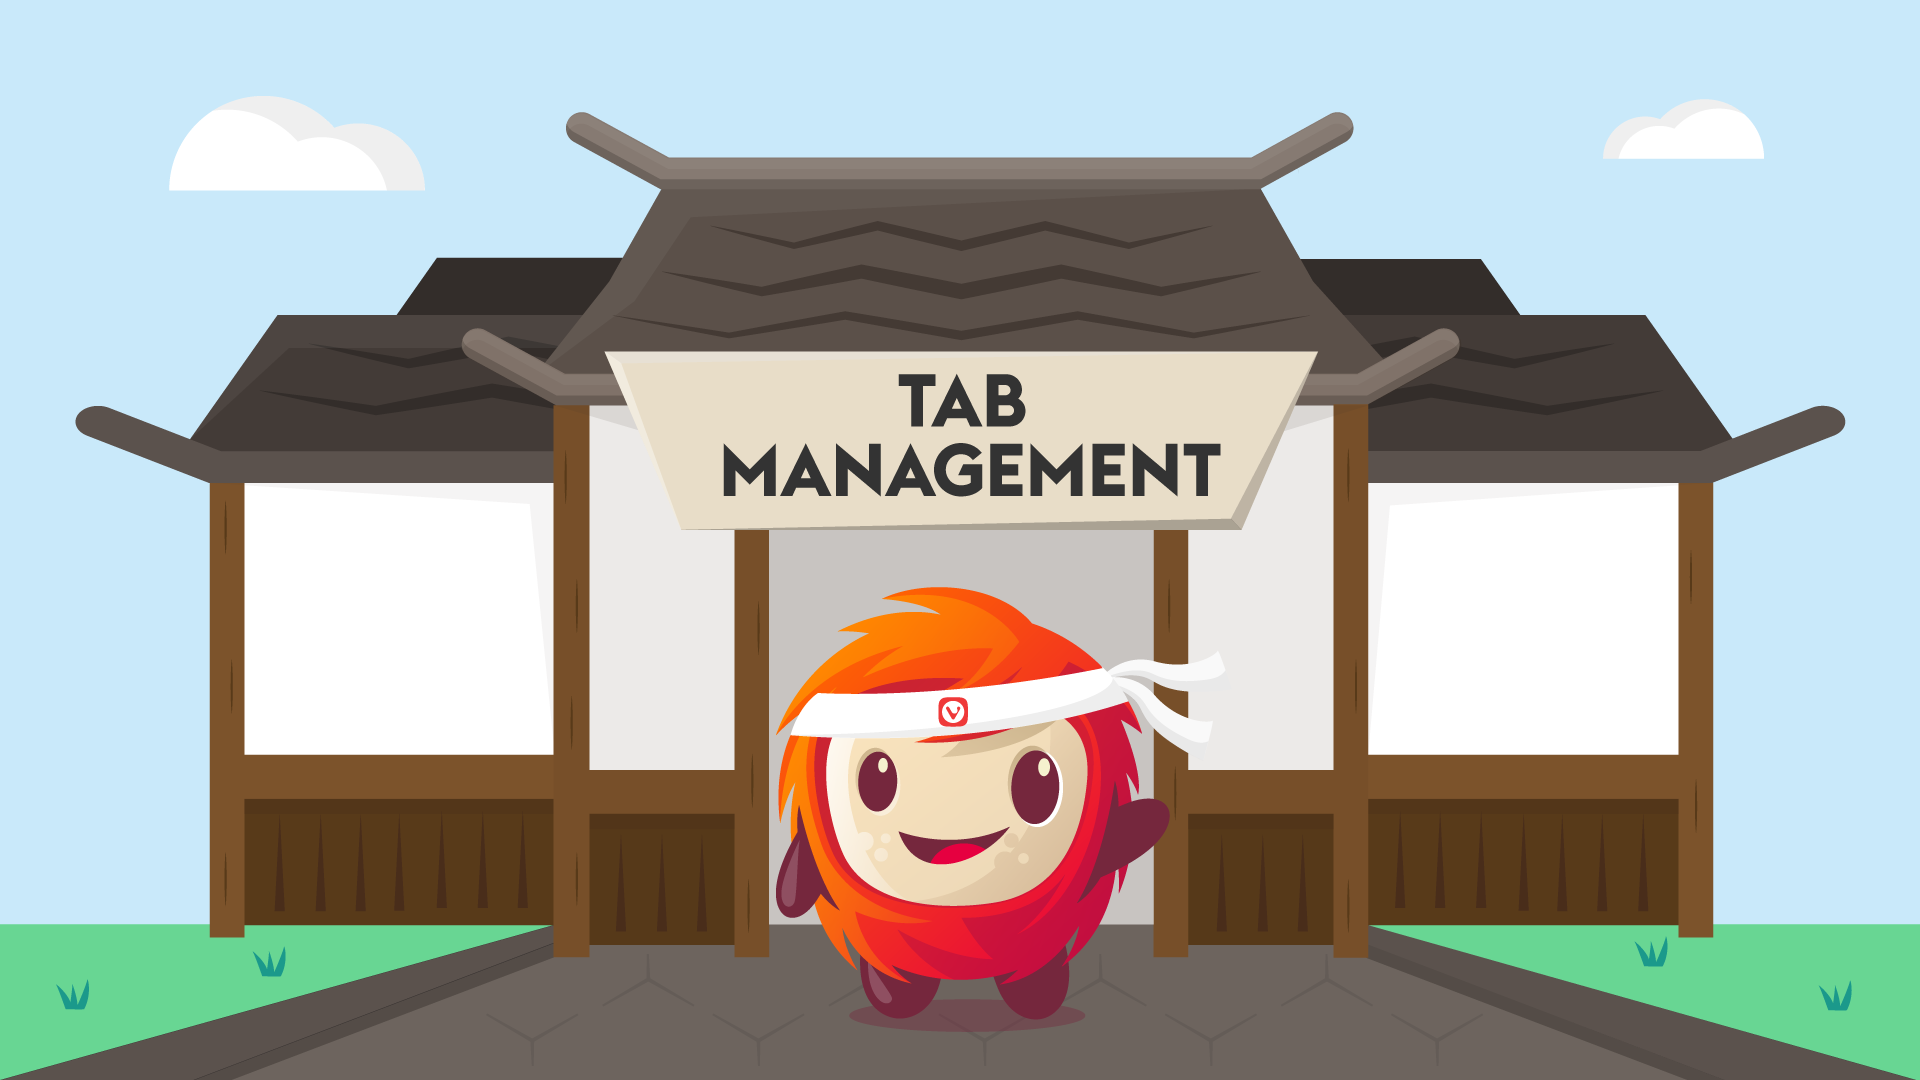 Tab-master